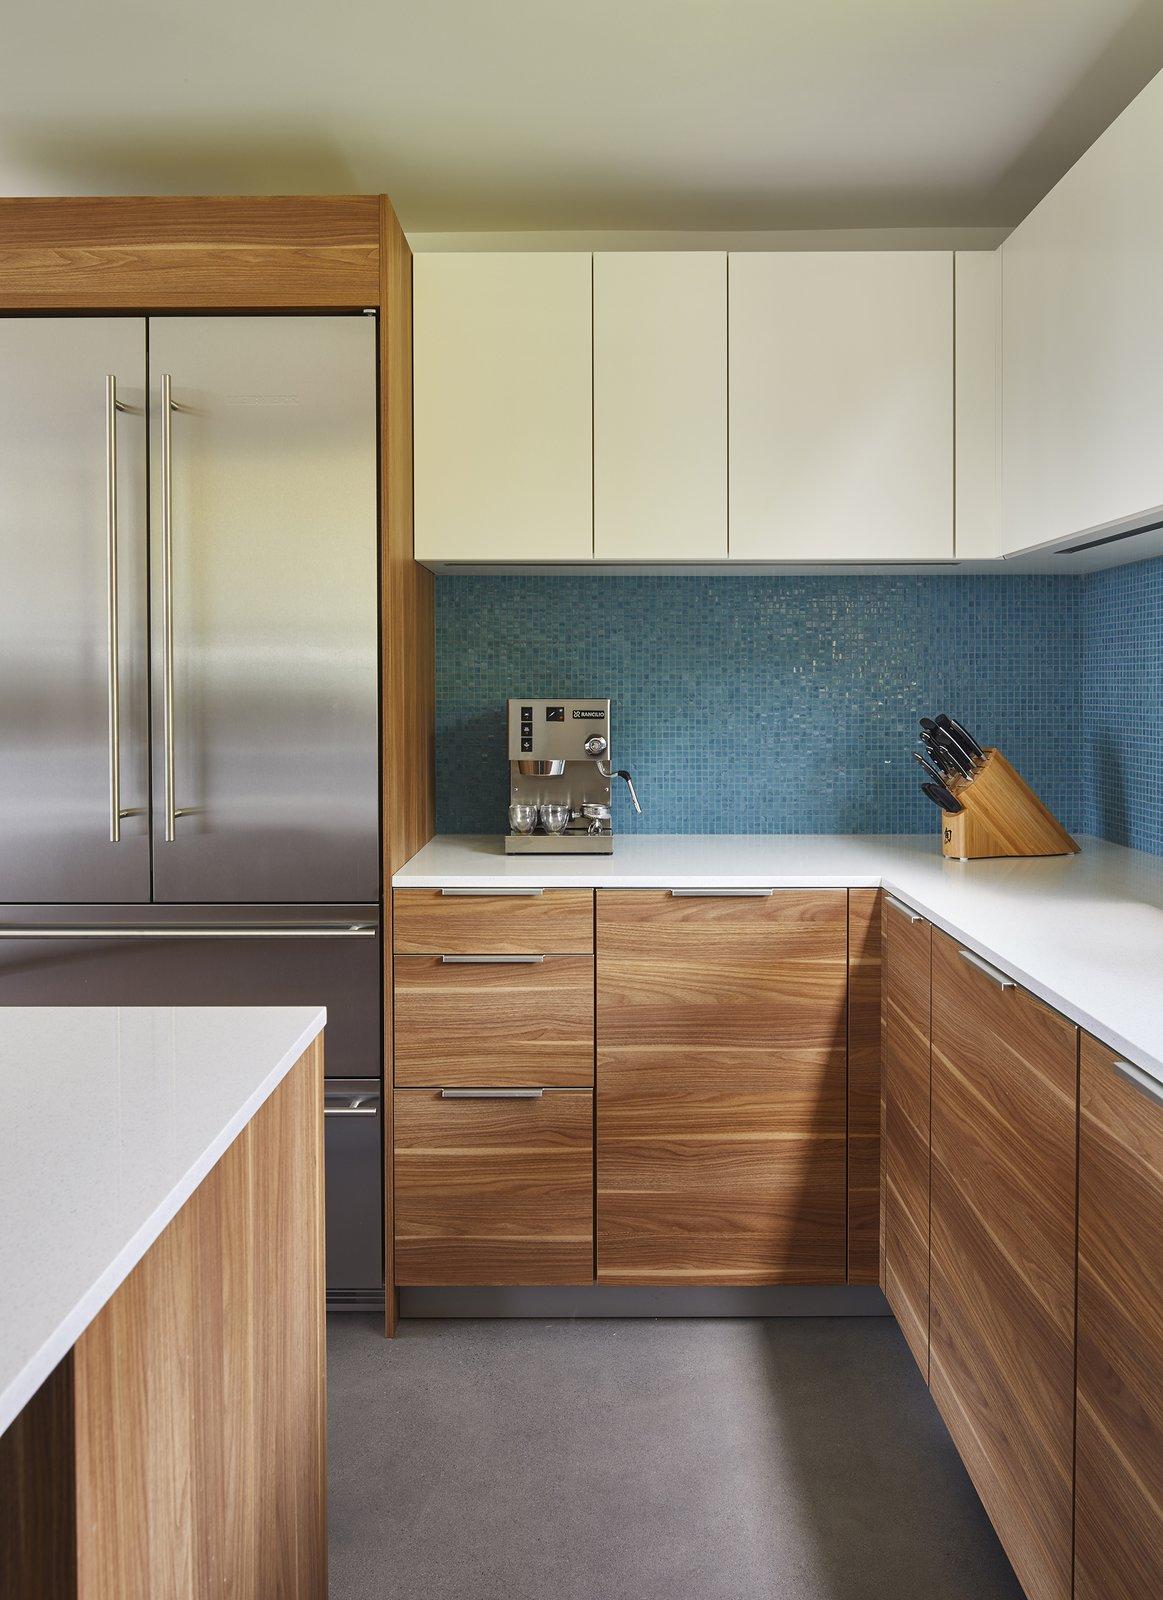 Kitchen, Engineered Quartz Counter, Refrigerator, Mosaic Tile Backsplashe, and Wood Cabinet  Issaquah Highlands Residence by Studio Zerbey Architecture & Design